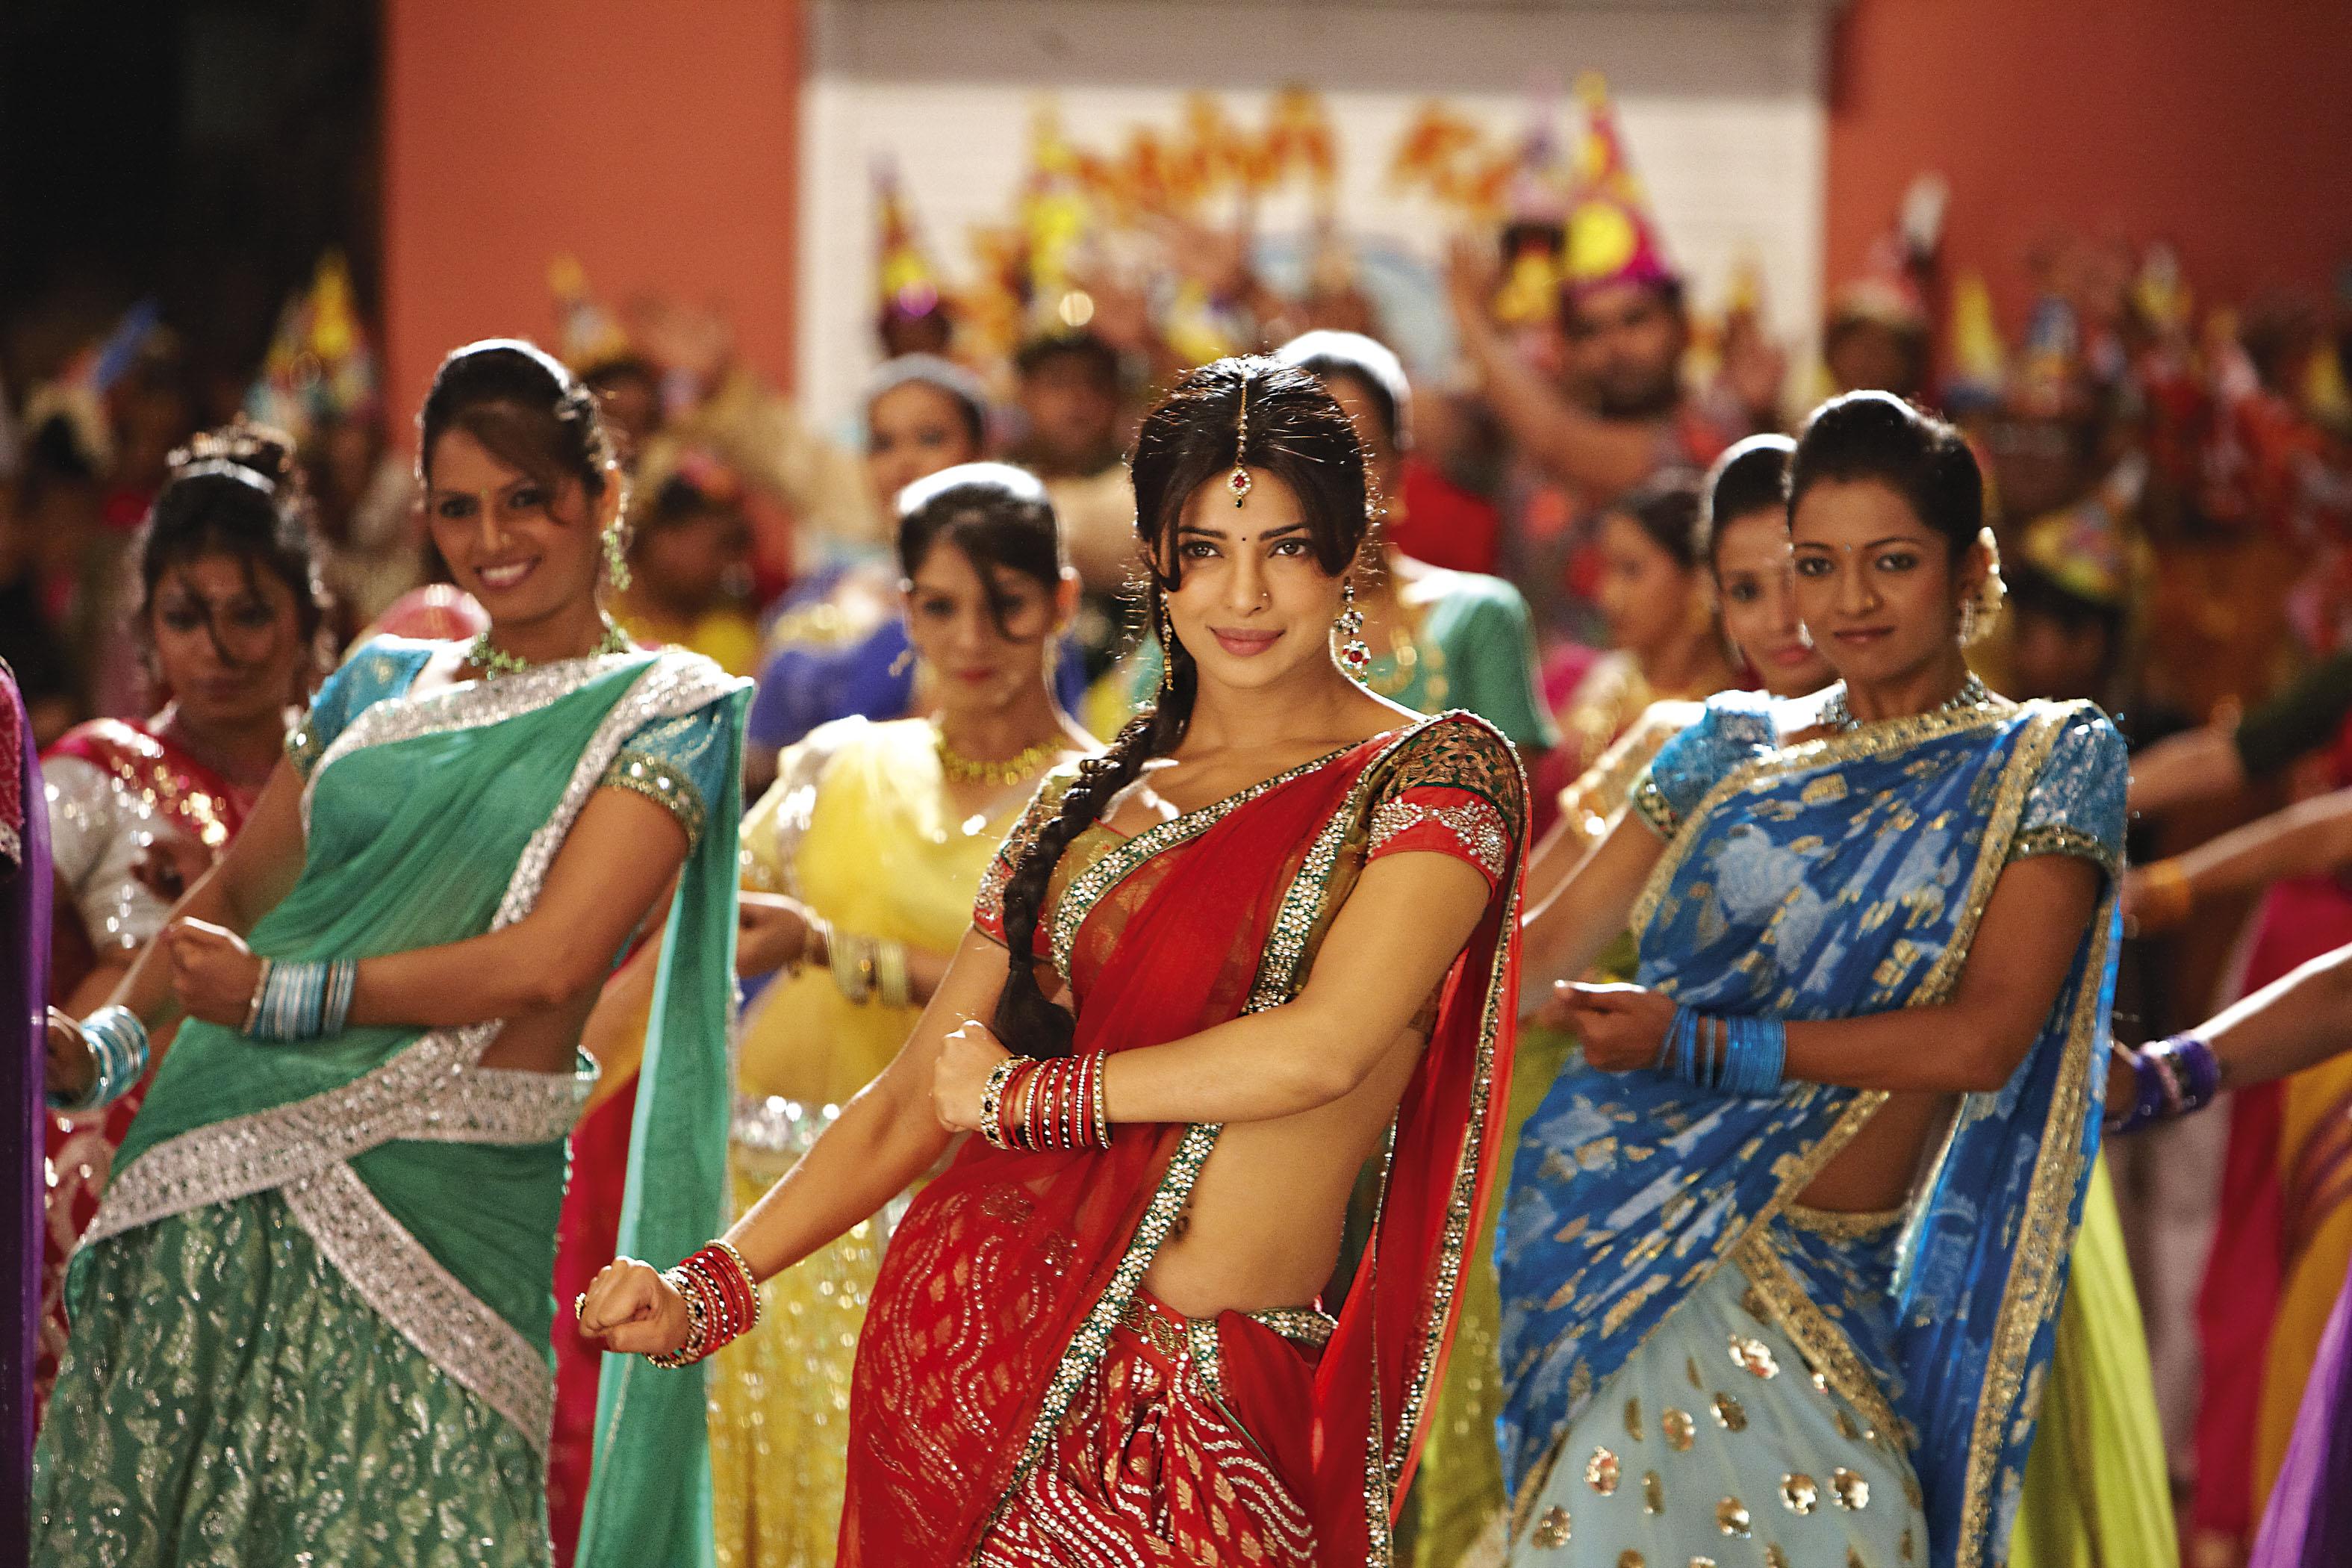 agneepath in priyanka wallpapers - 3150x2100 - 1169671